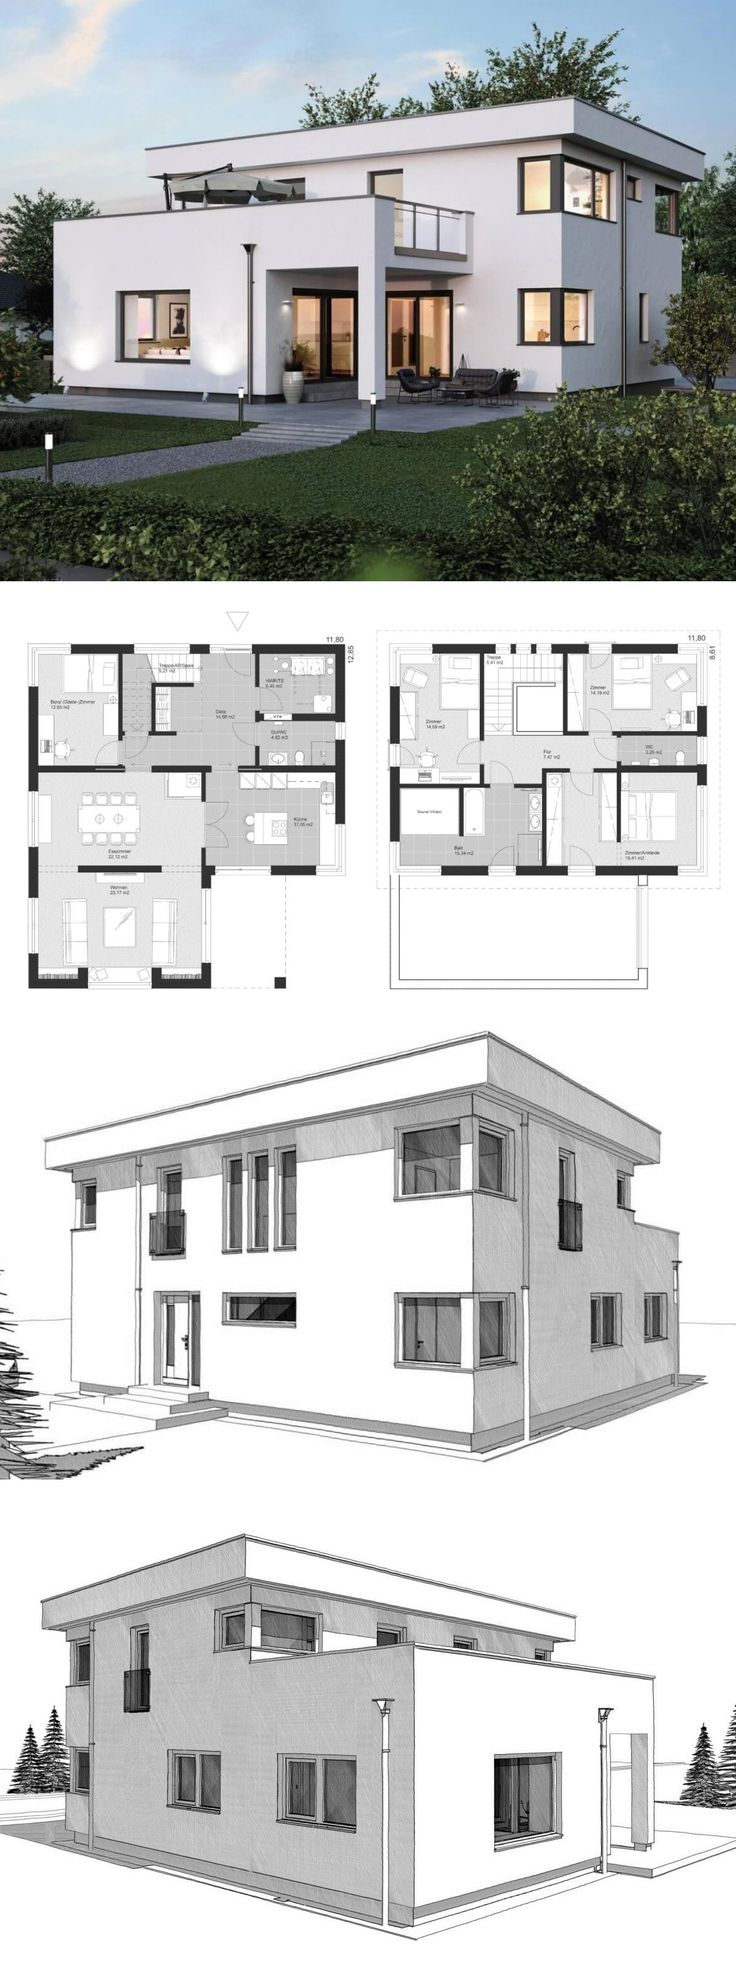 Bauhaus Stadtvilla Grundriss modern mit Flachdach